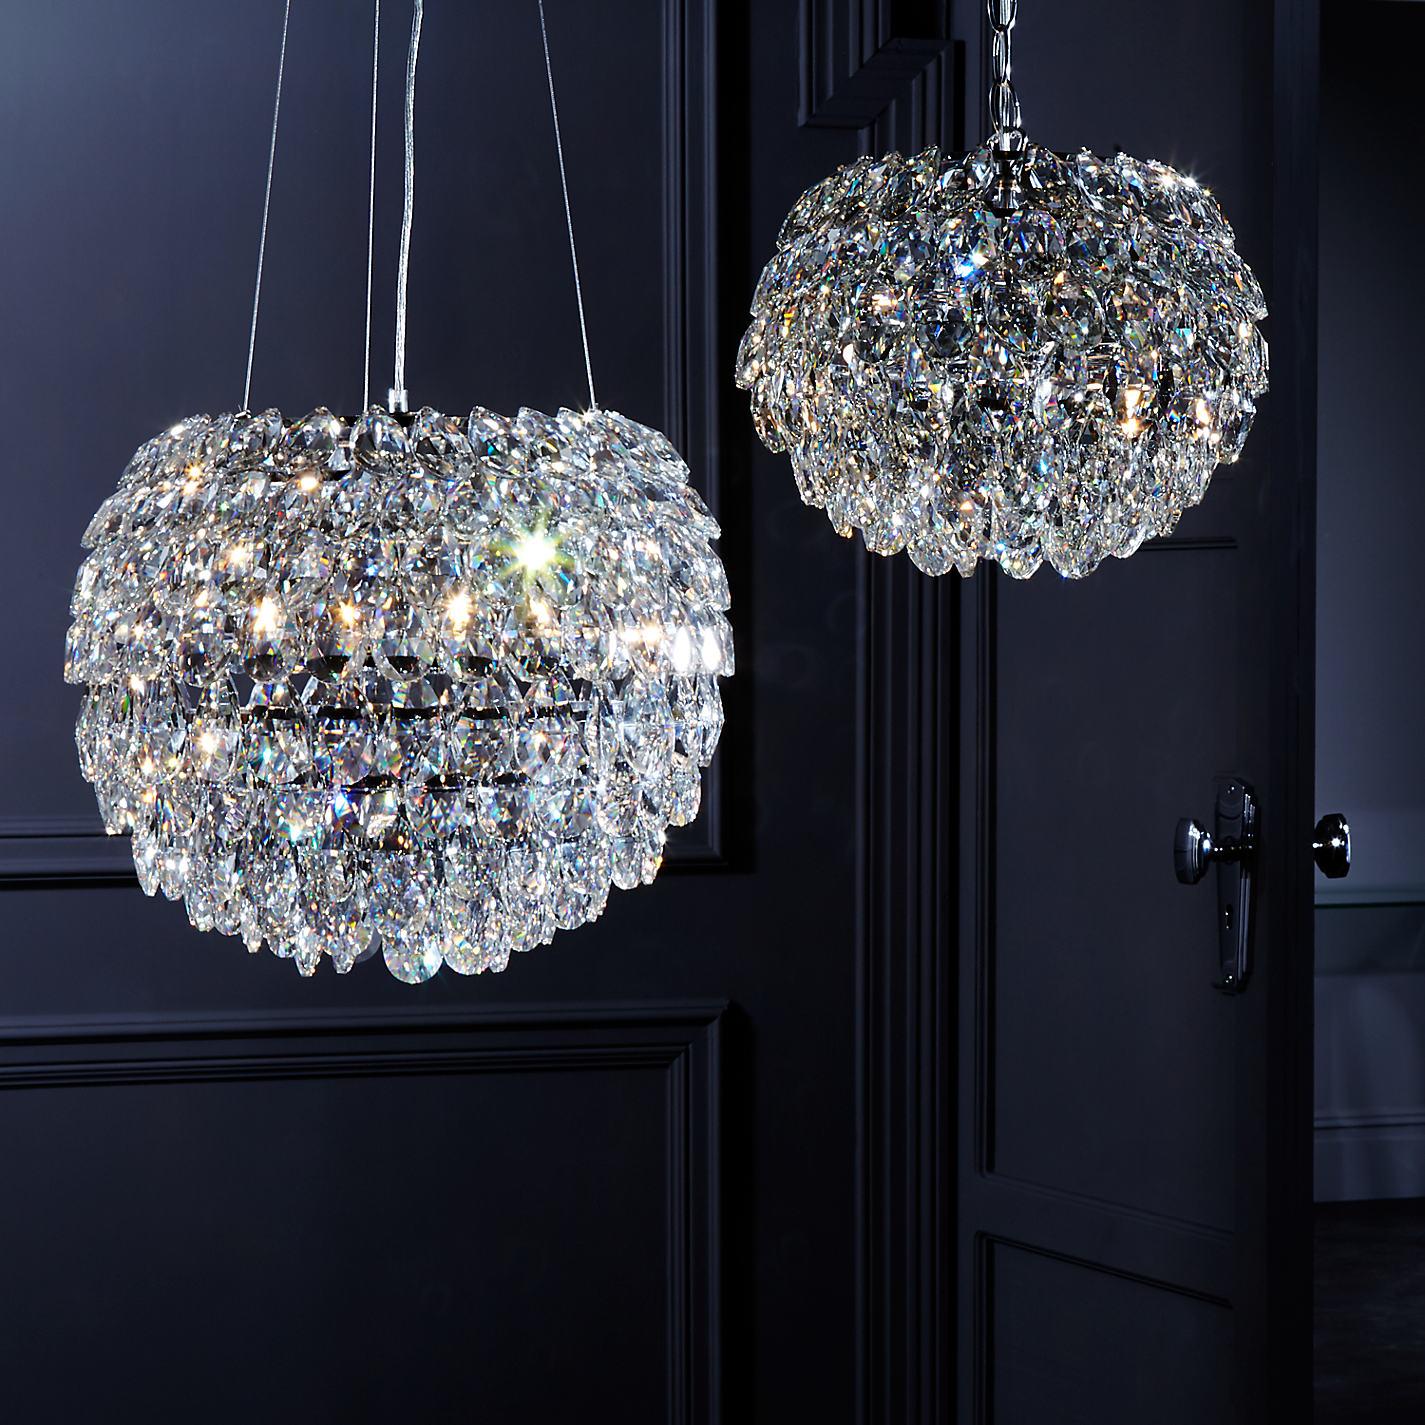 Fascinating 10 bathroom chandeliers john lewis inspiration design bathroom chandeliers john lewis buy john lewis alexa tear drop ceiling light pendant john lewis arubaitofo Gallery